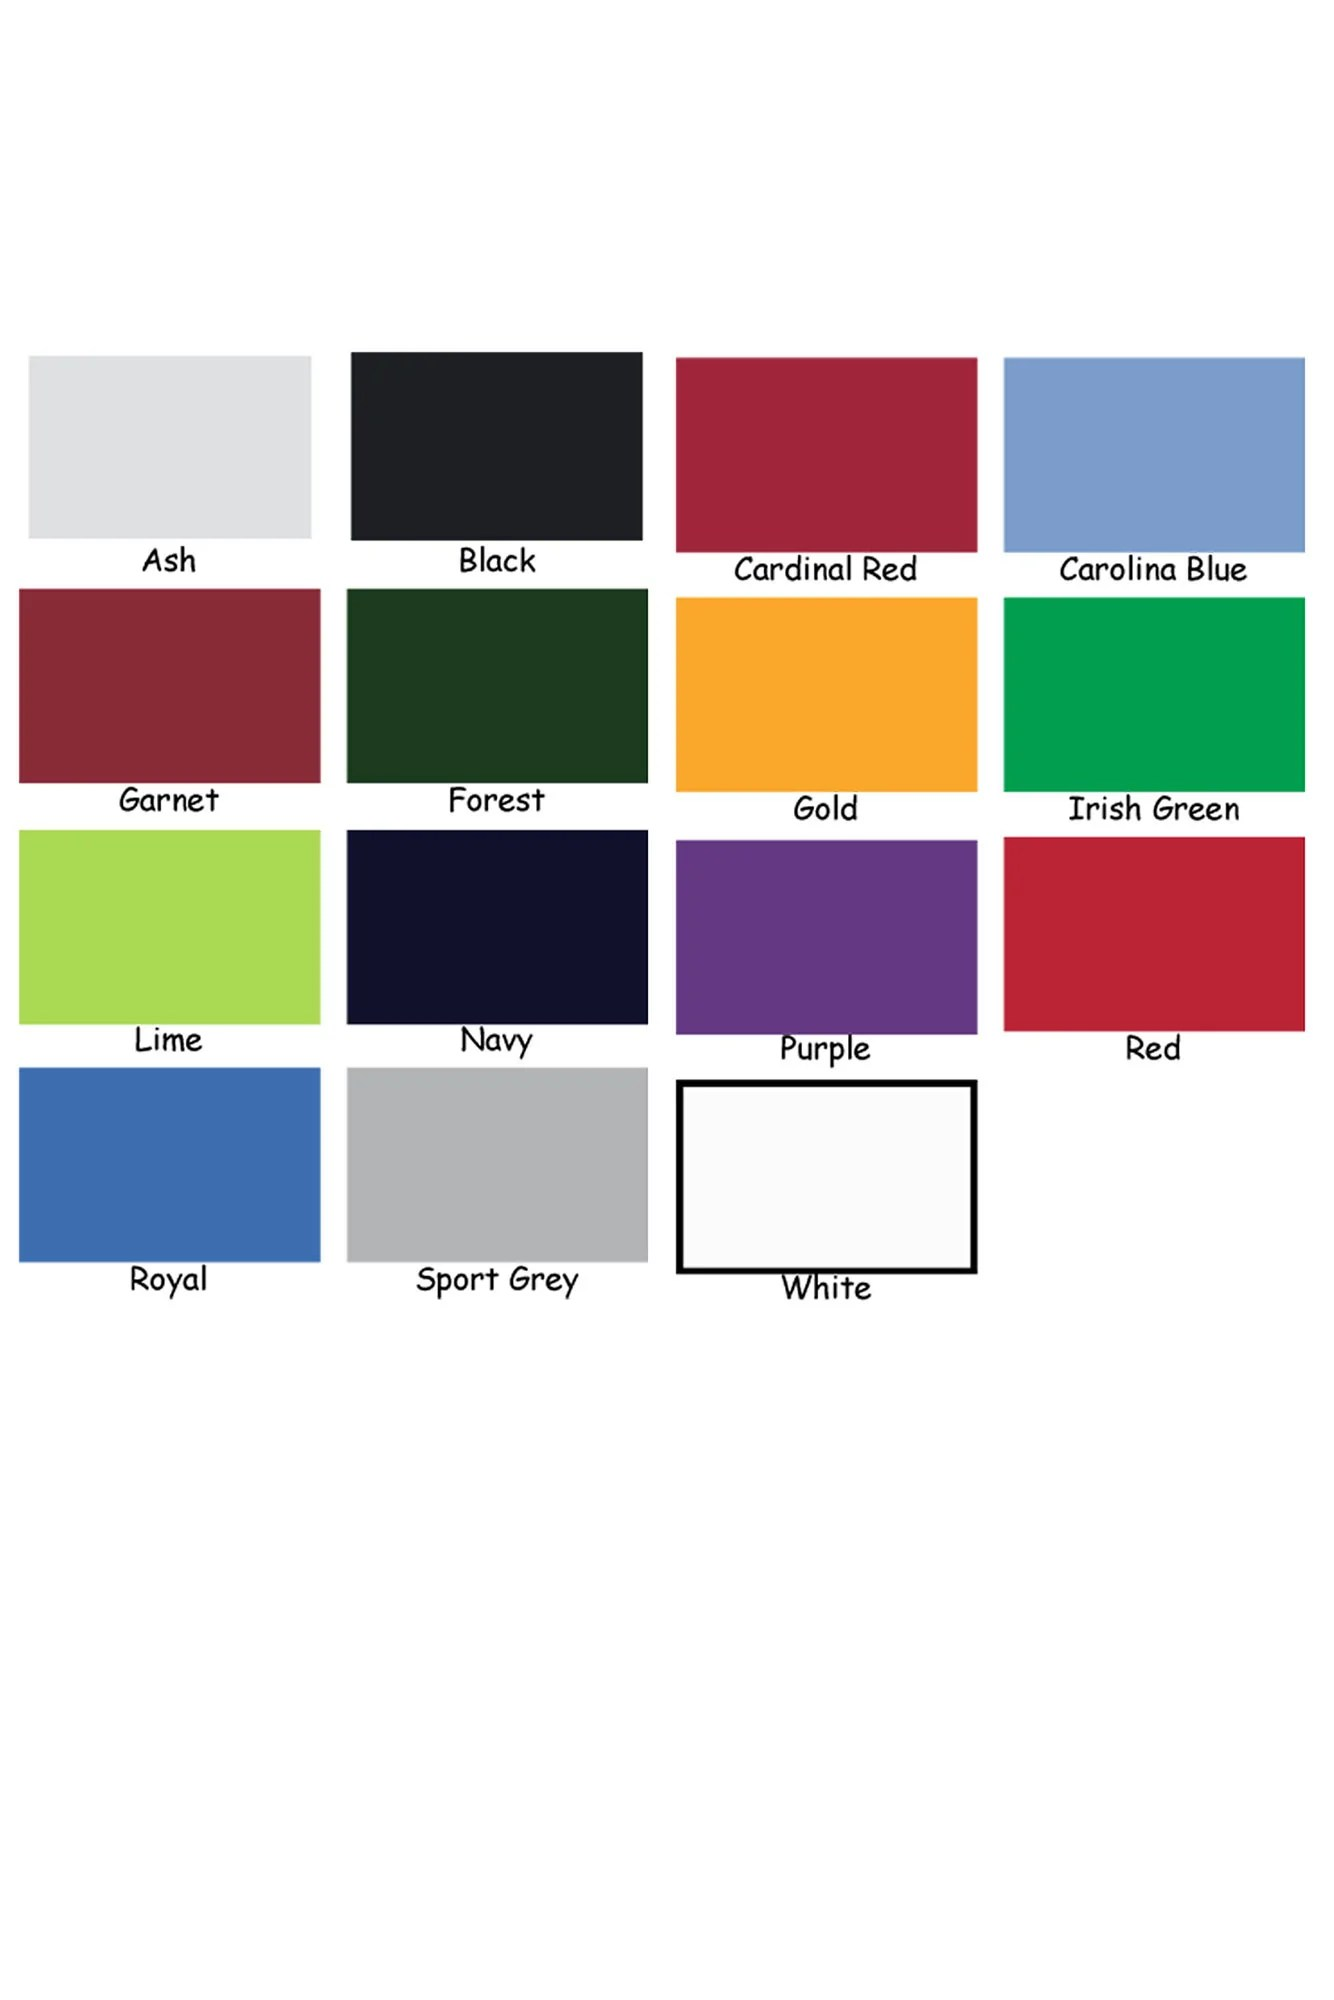 Gildan shirt color chart also bcd tofu house rh bcdtofu